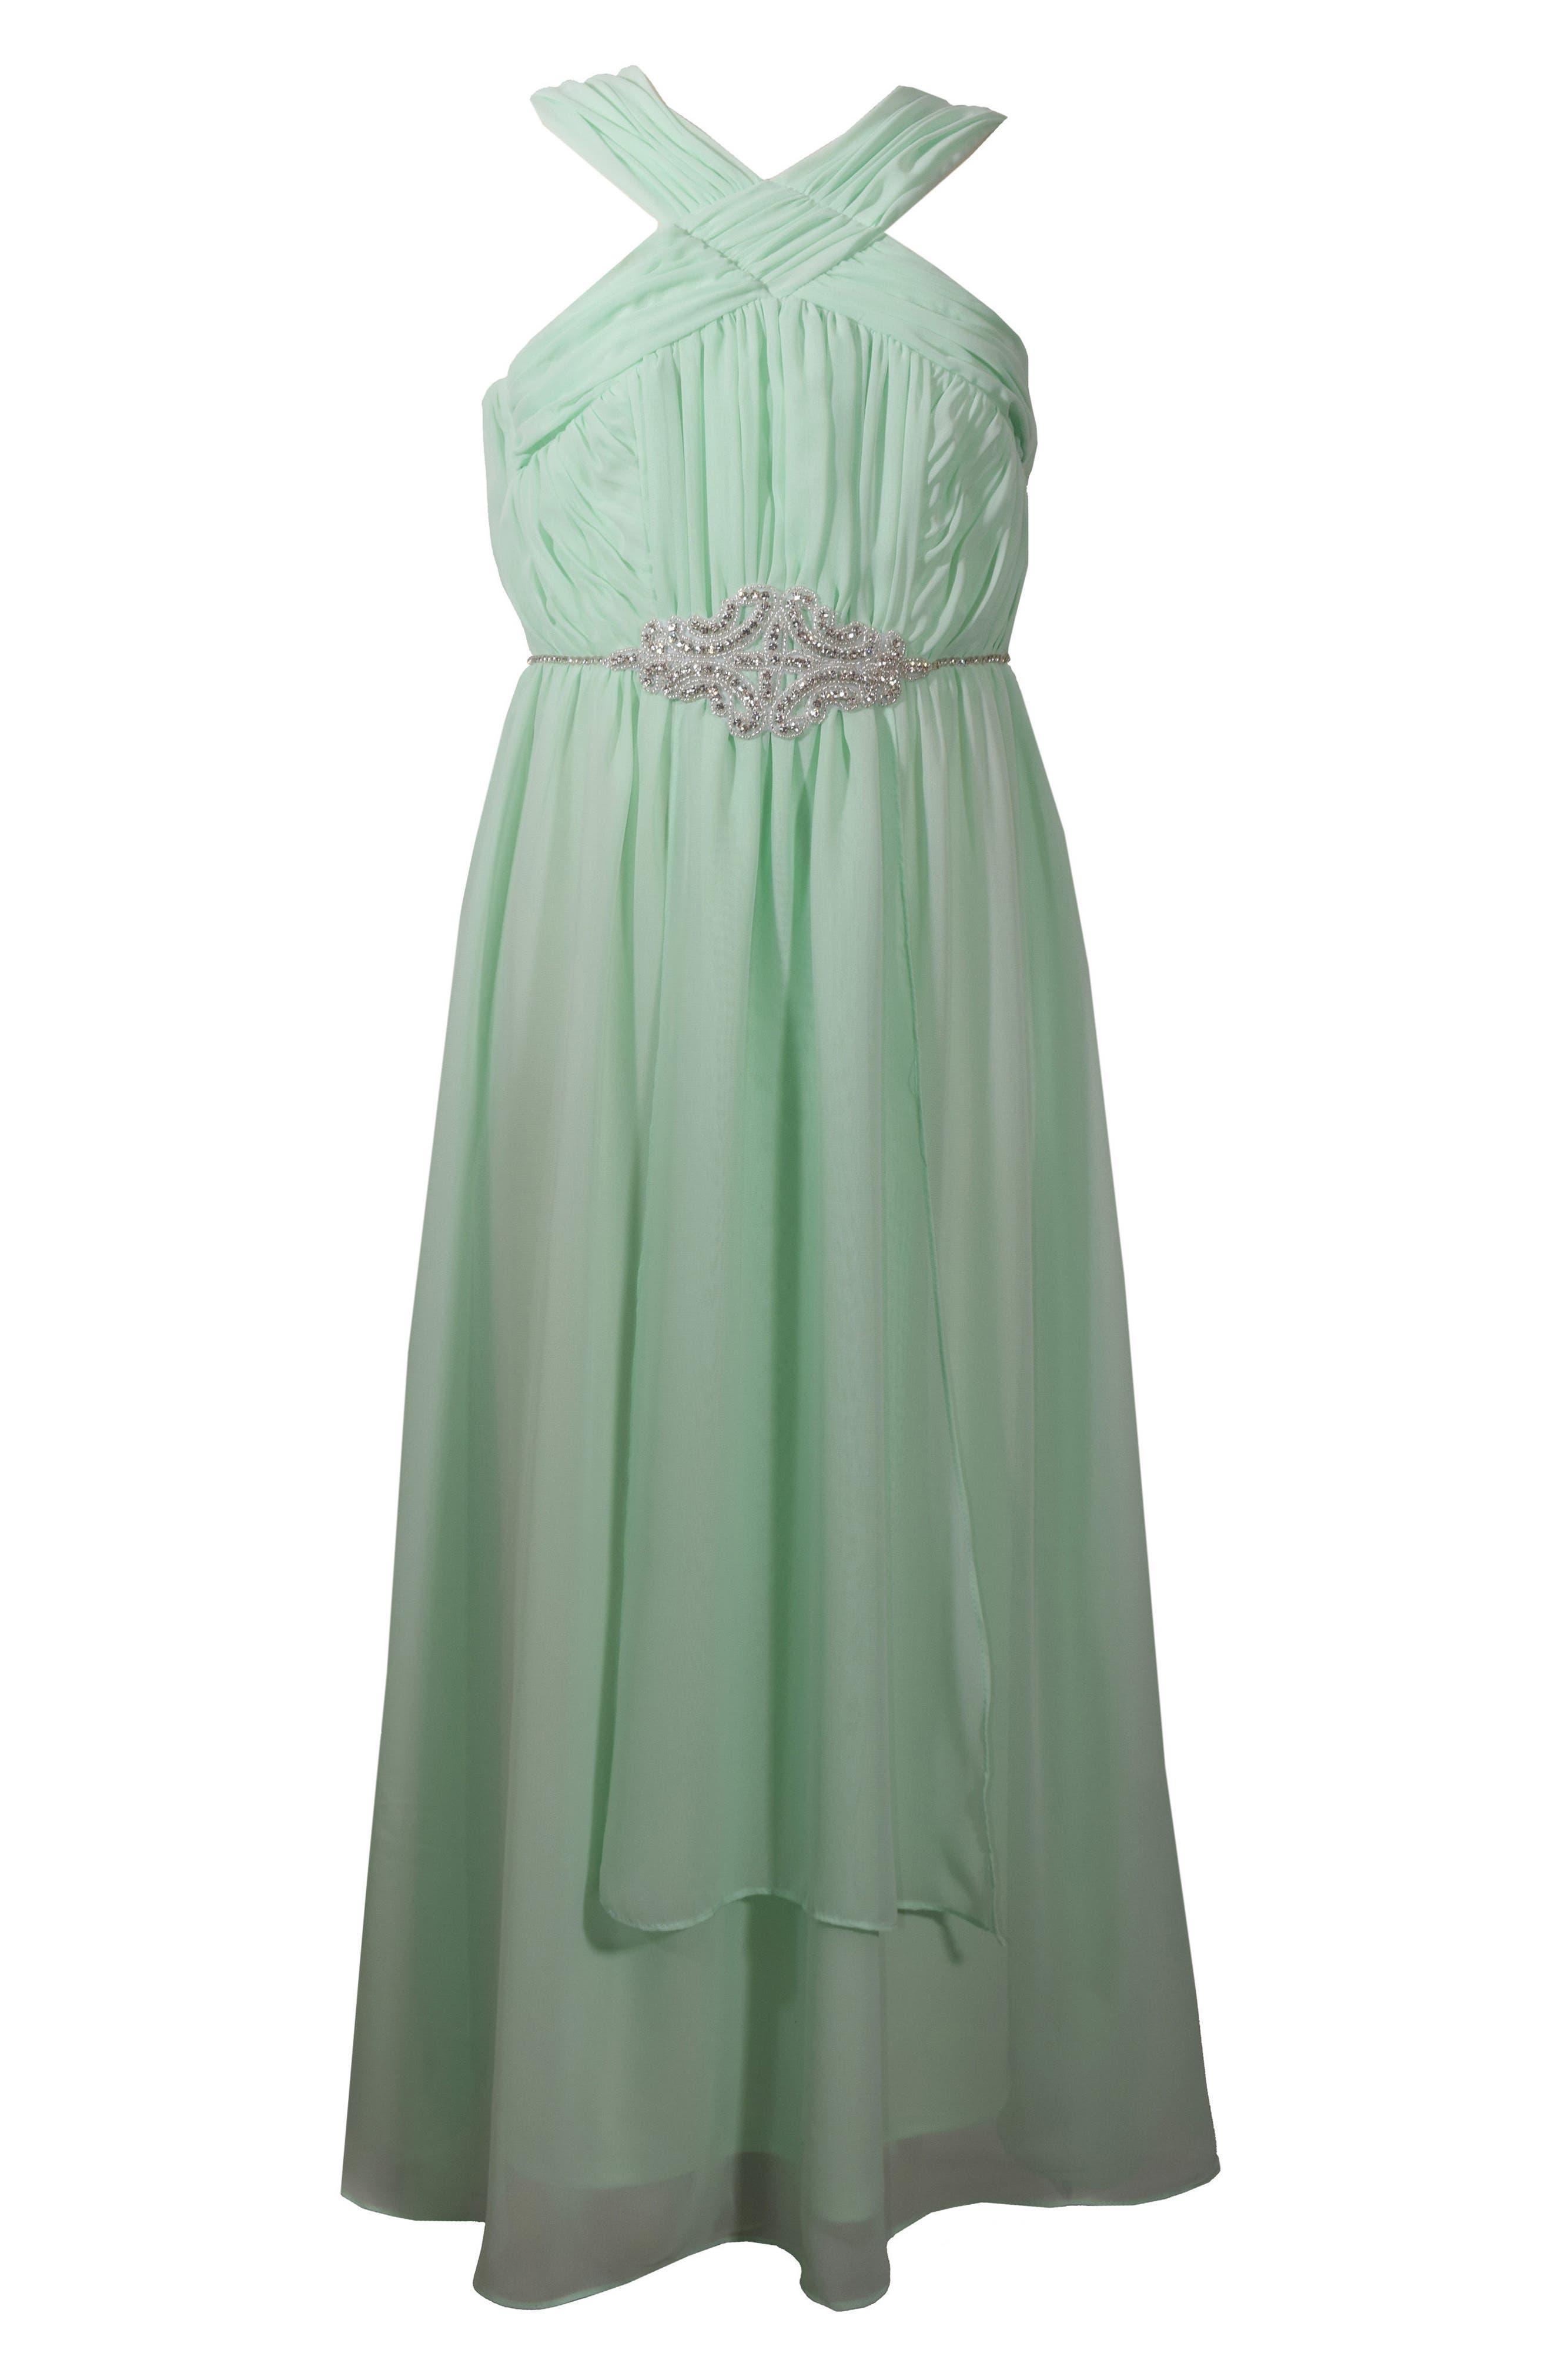 Alternate Image 1 Selected - Iris & Ivy Sleeveless Chiffon Dress (Big Girls)